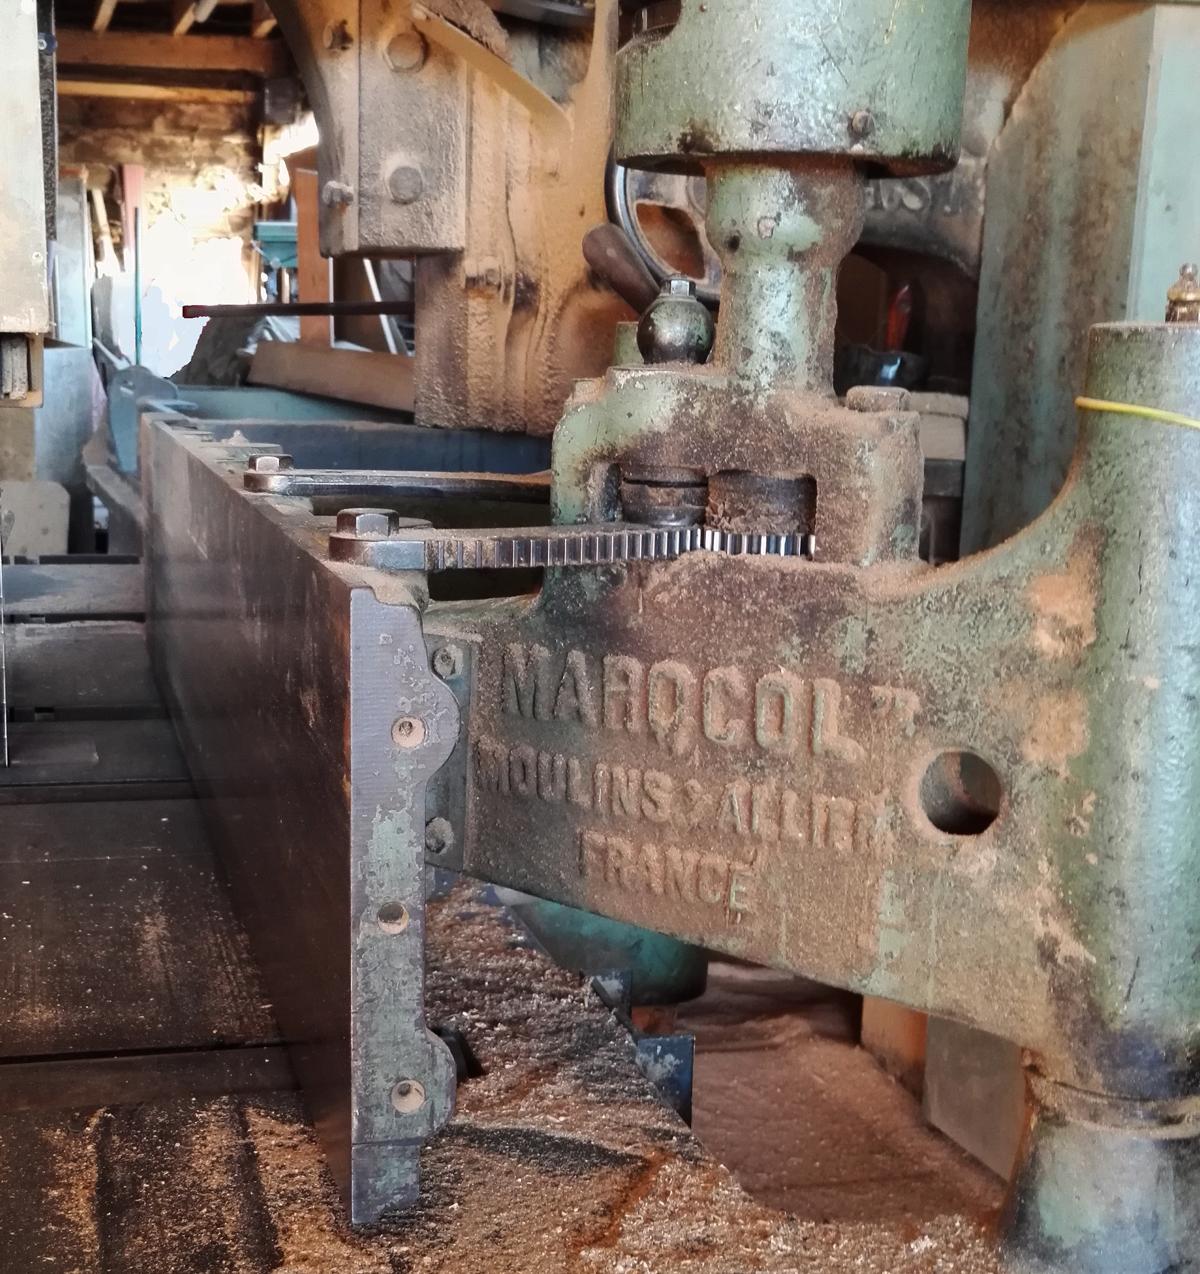 French wood working machine